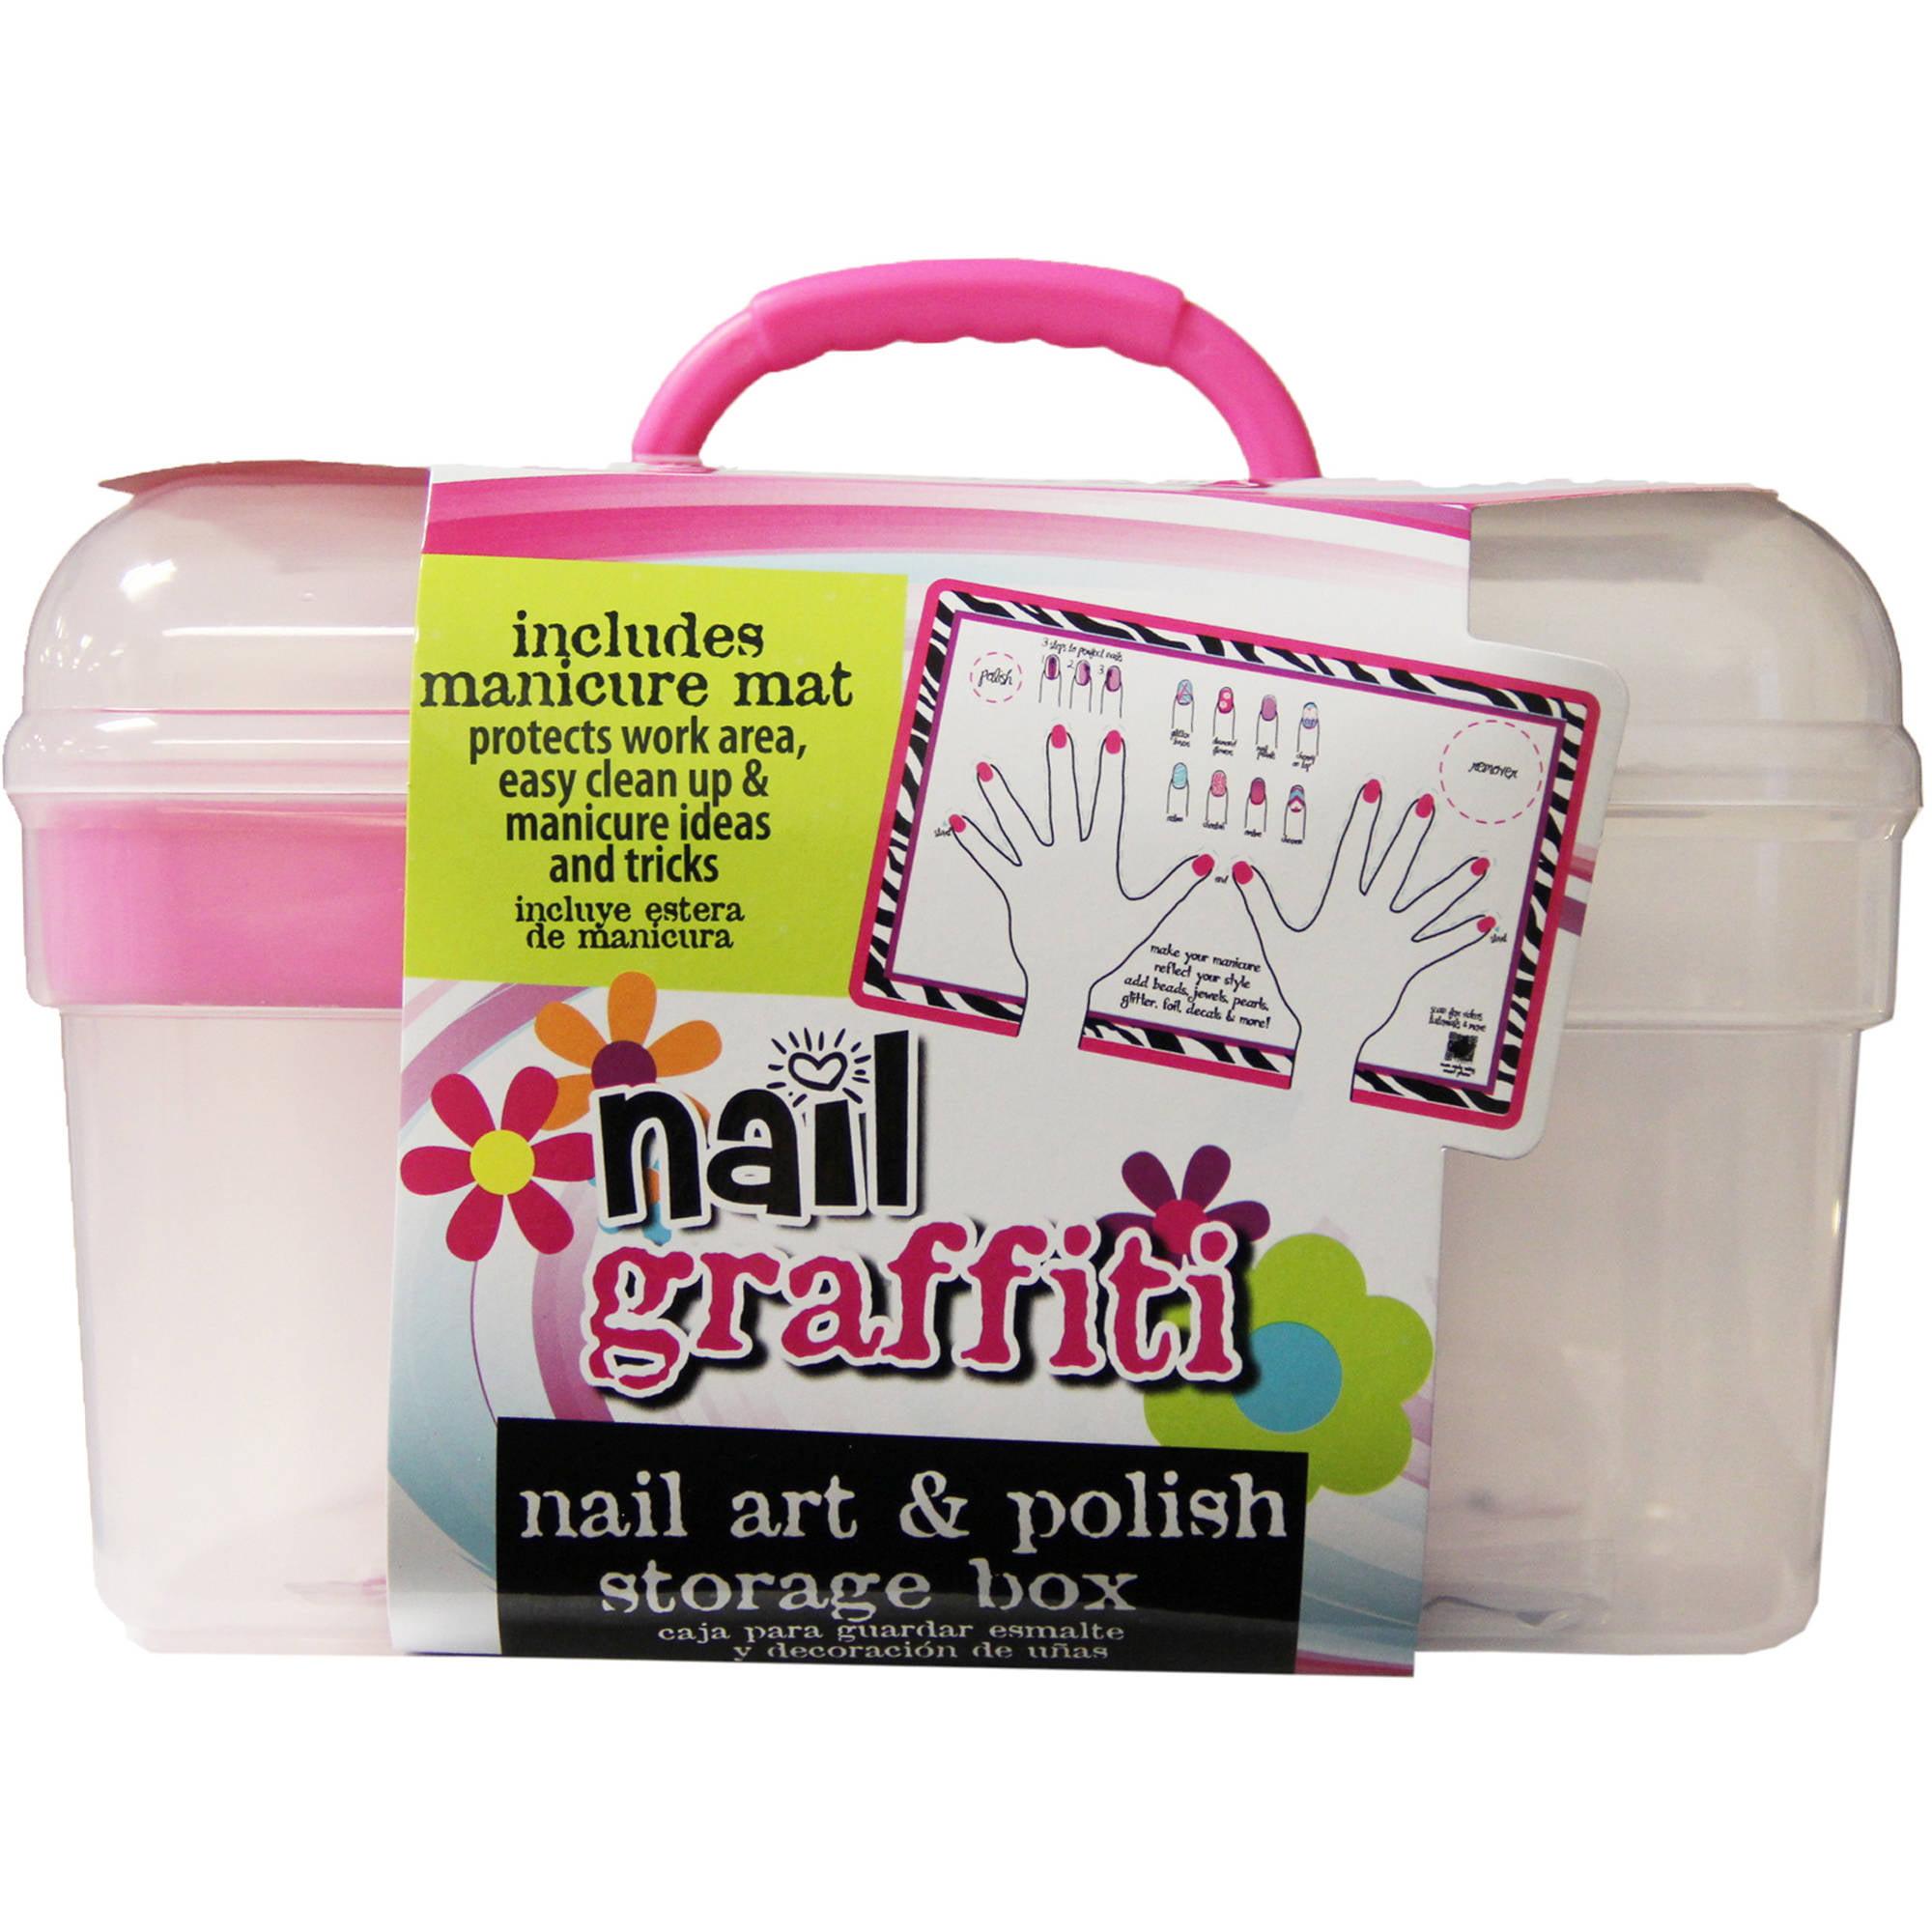 Nail Graffiti Nail Art & Polish Storage Box - Walmart.com